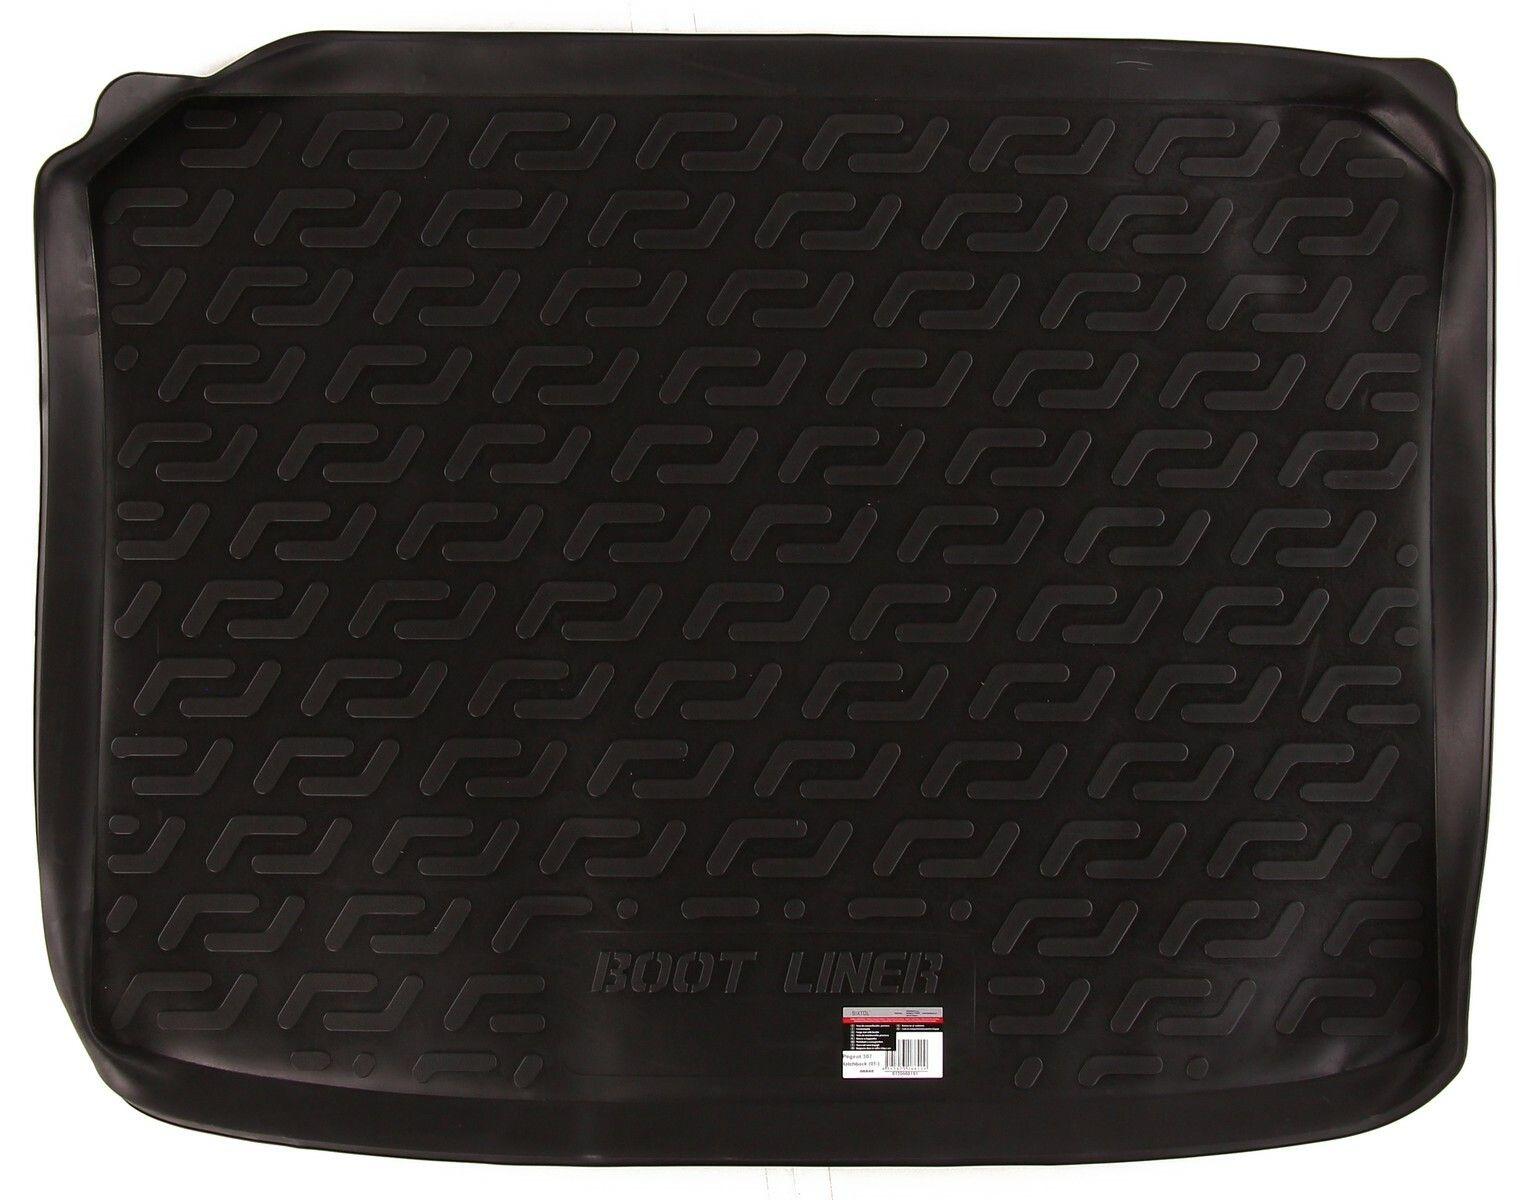 Vana do kufru gumová Peugeot 307 Hatchback (01-)